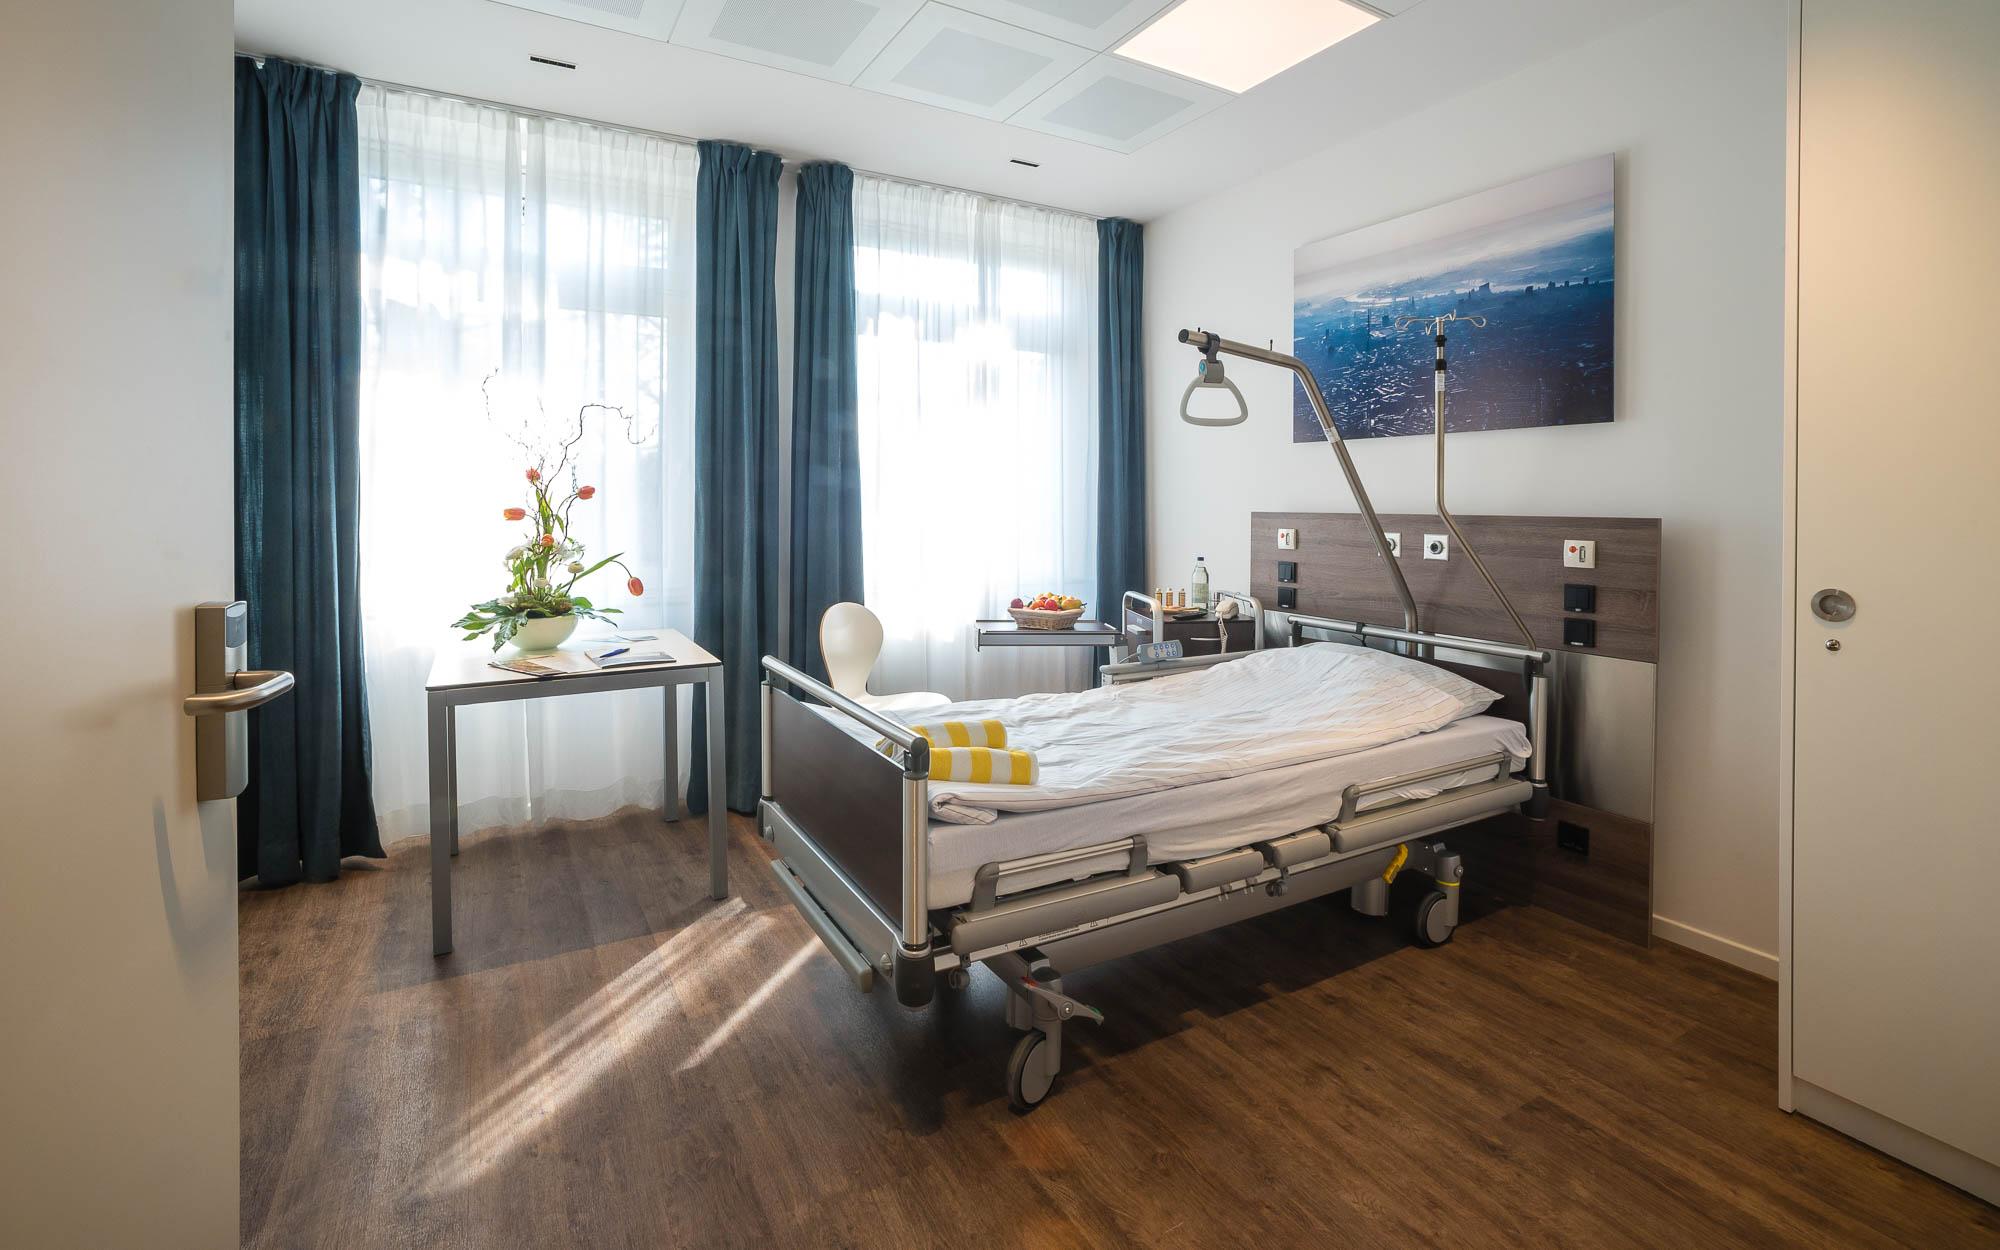 station r im krankenhaus jerusalem mammazentrum hamburg am krankenhaus jerusalem. Black Bedroom Furniture Sets. Home Design Ideas